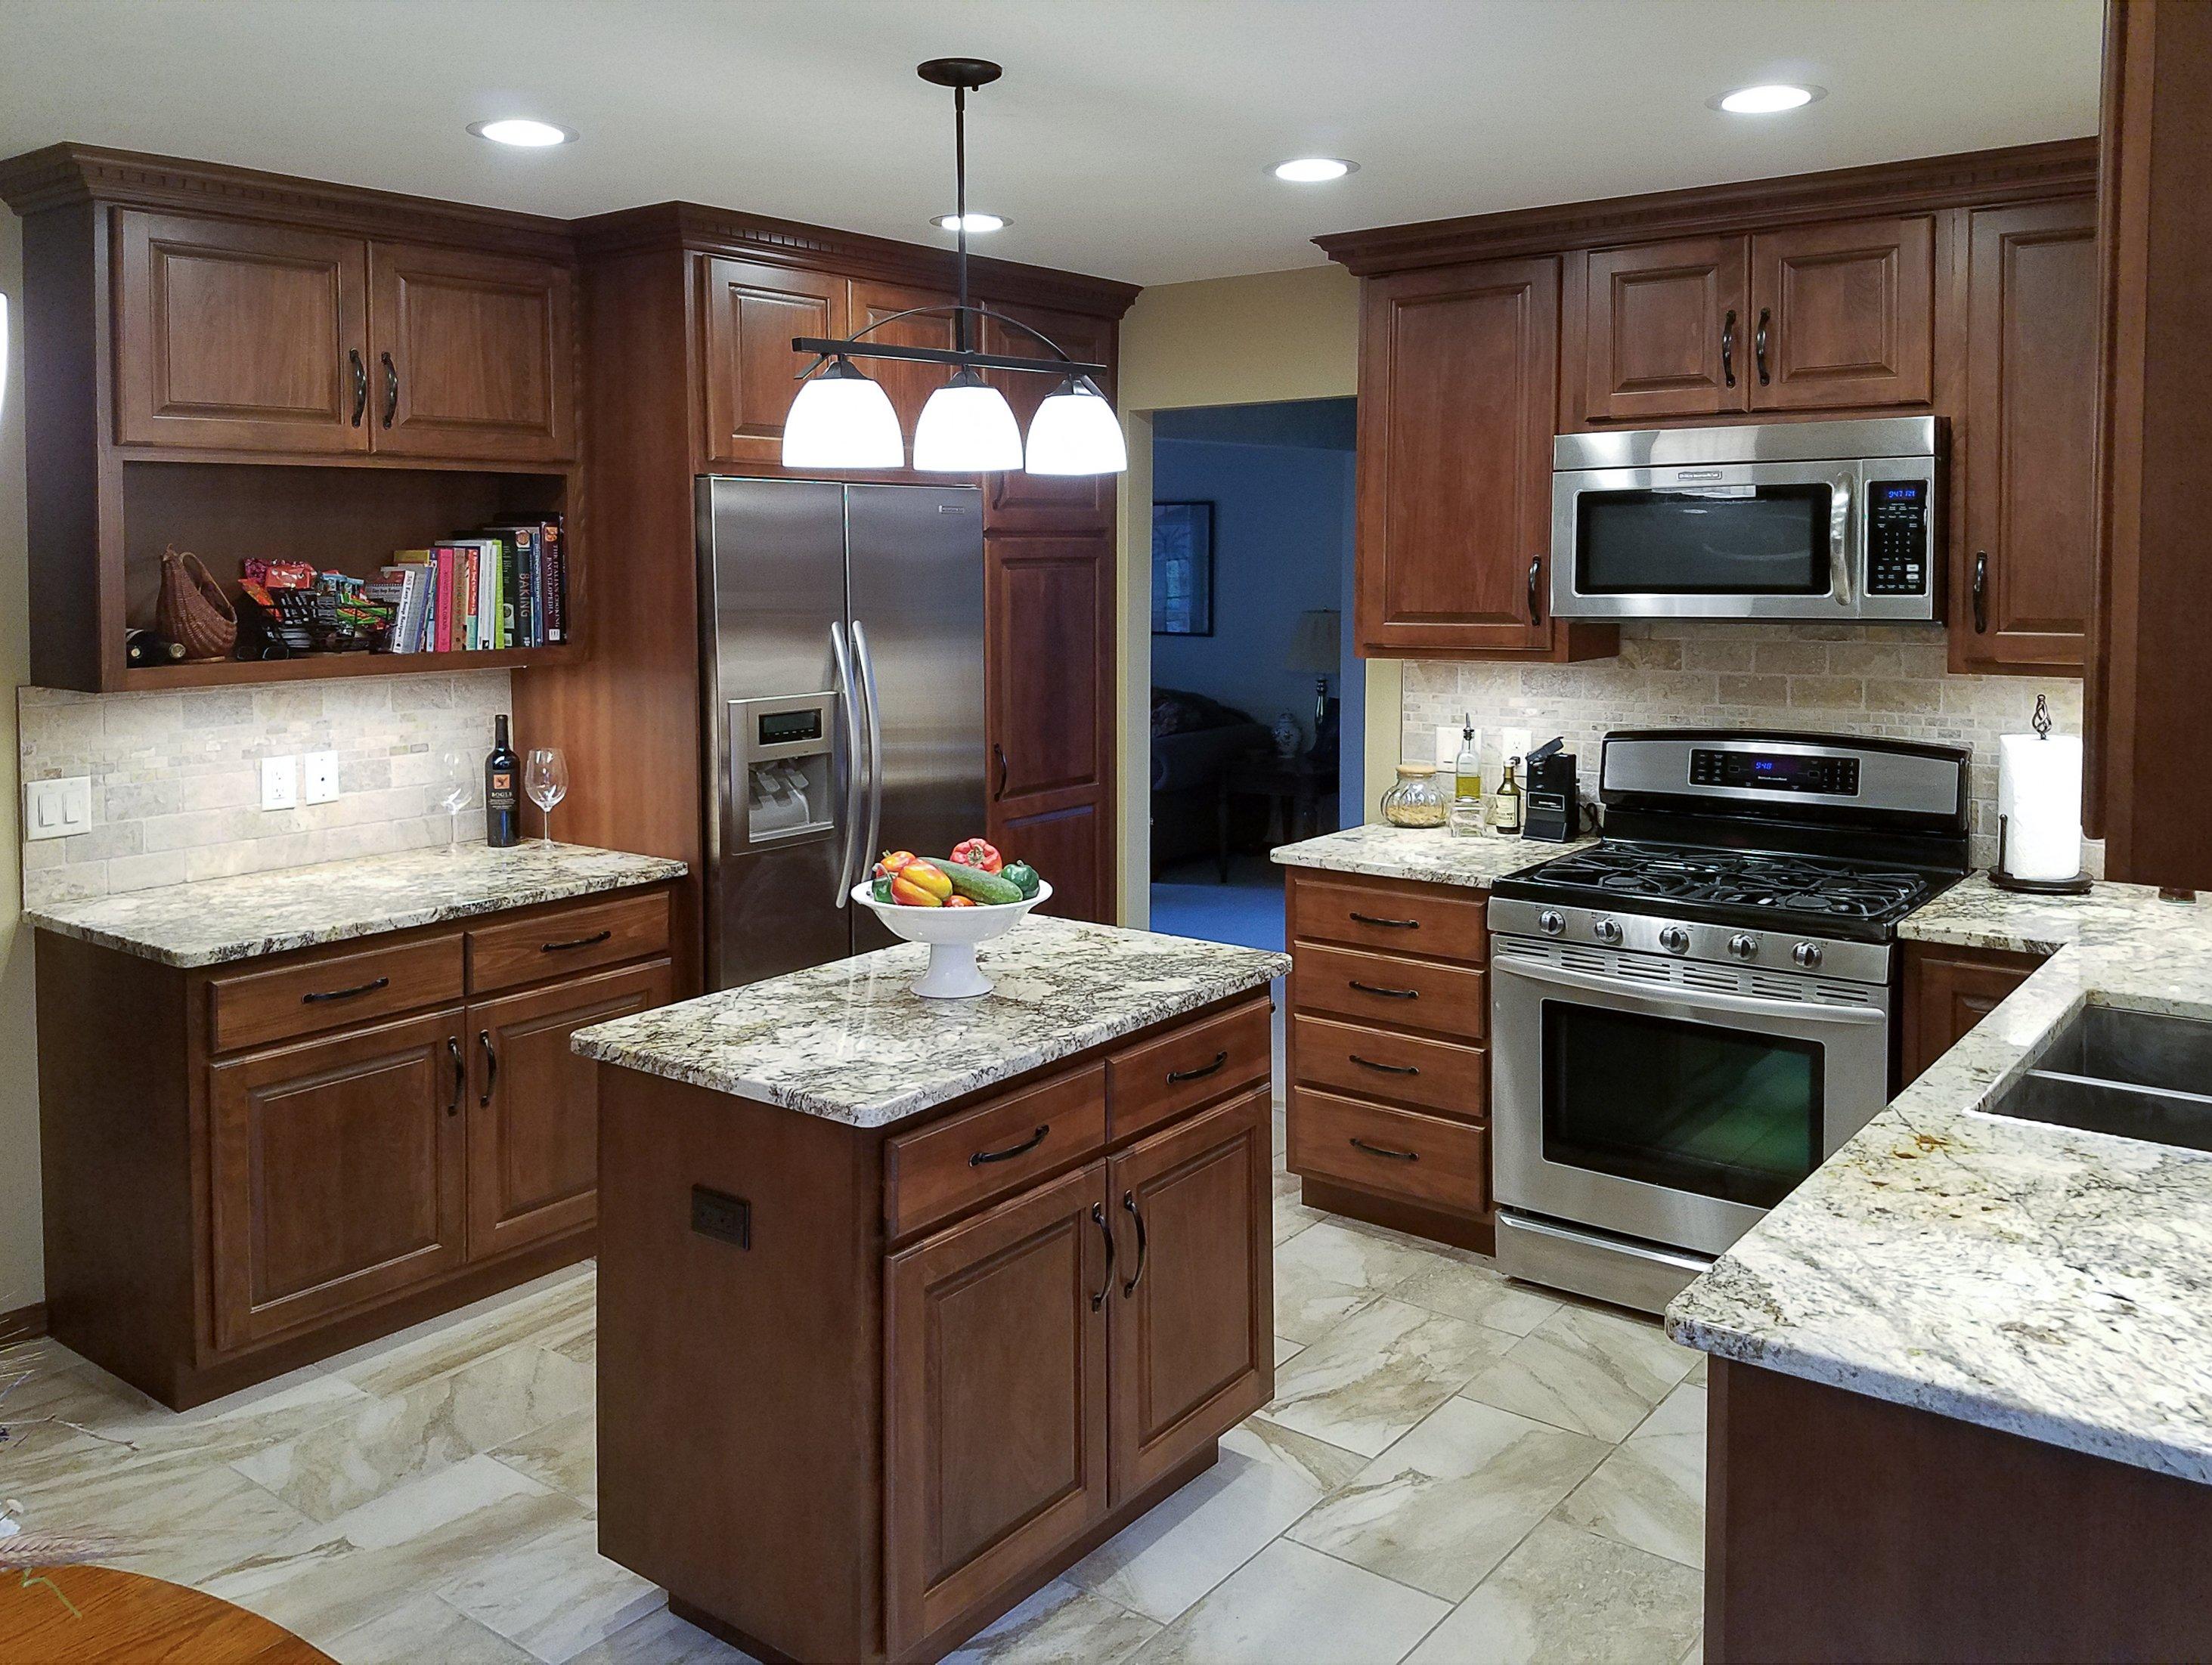 Kitchen Remodeling and Design, u-shape kitchen design, dark kitchen cabinets, light tile floor, small island